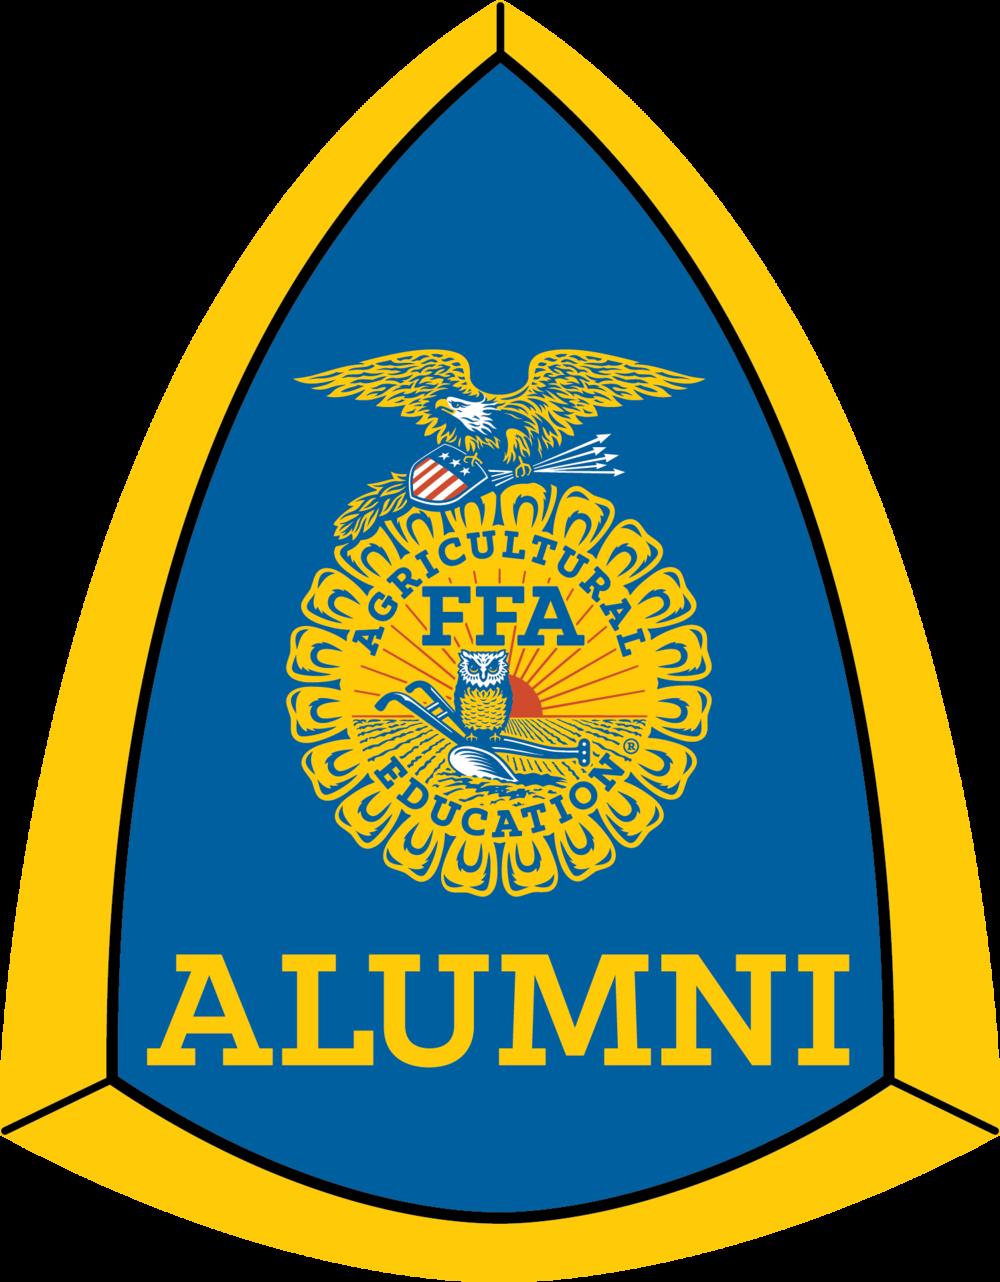 2015 Alumni_CMYK.png